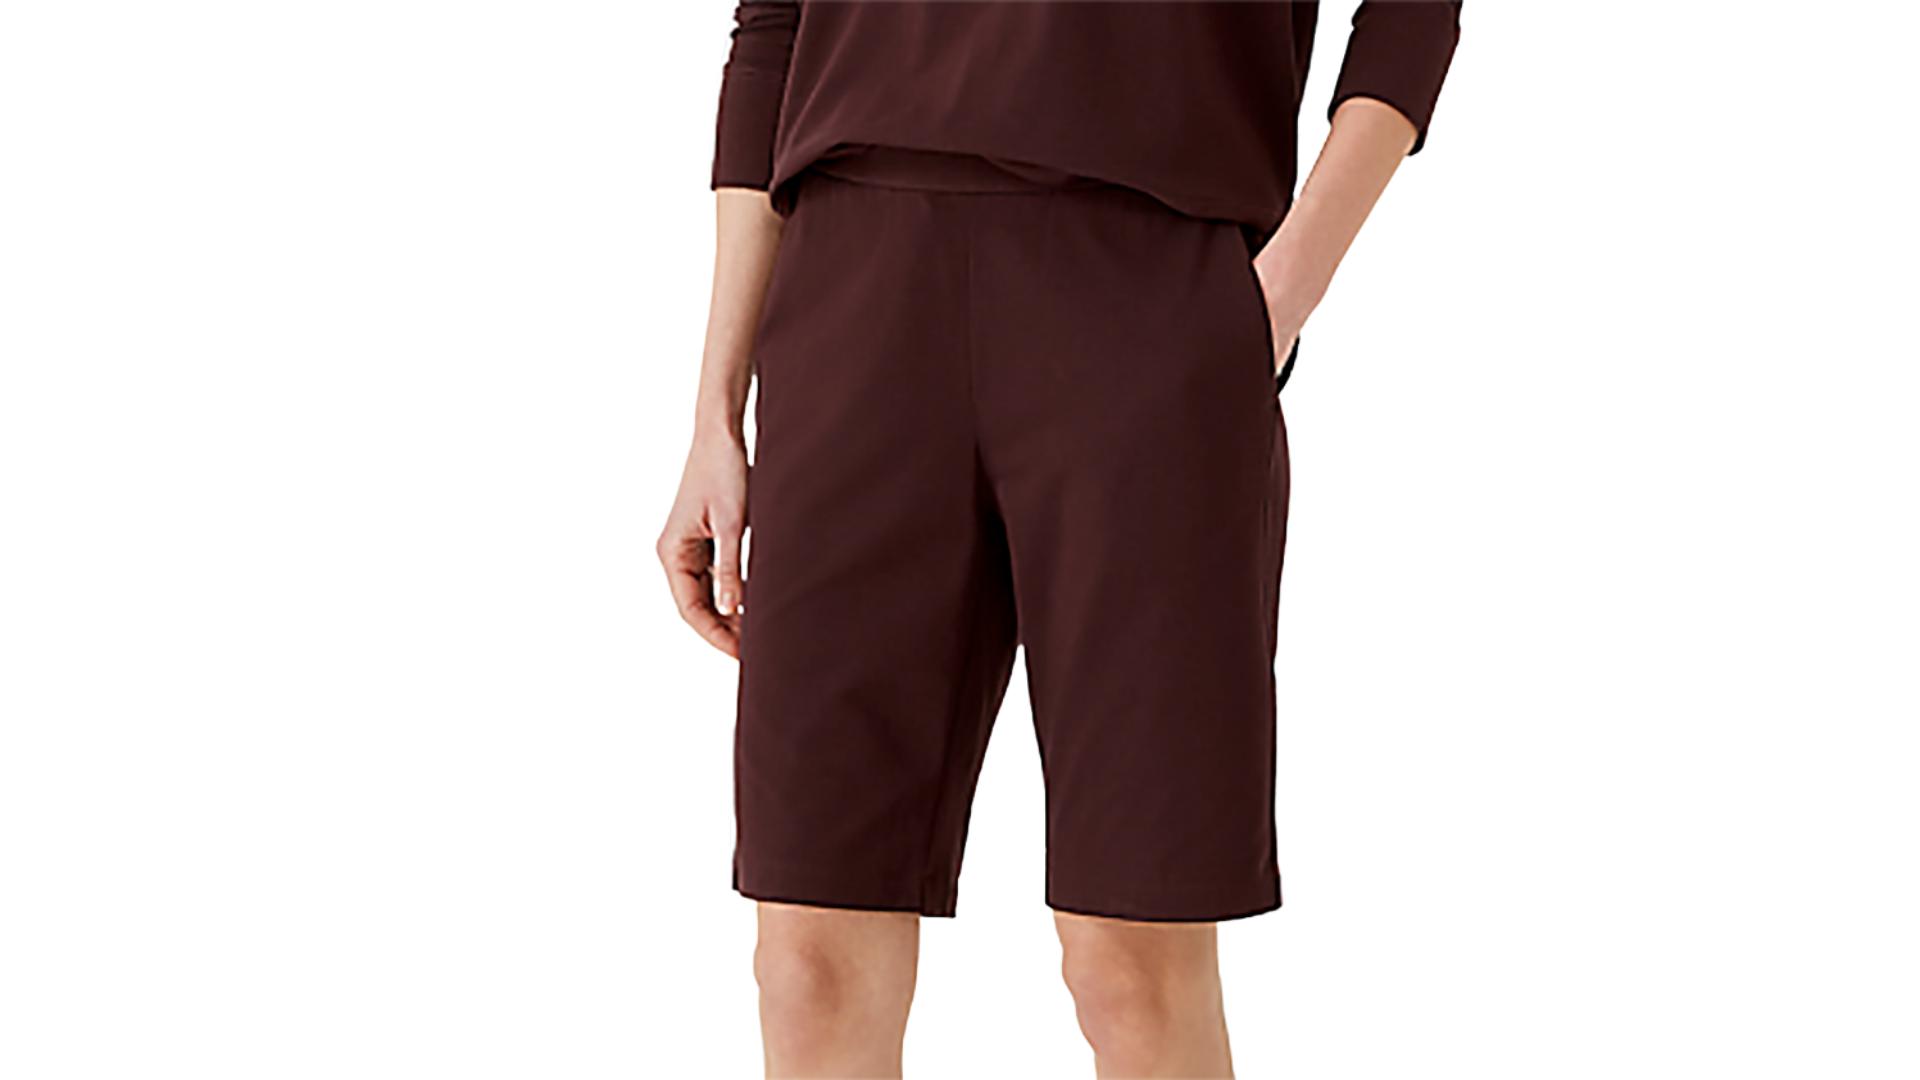 eileen fisher shorts